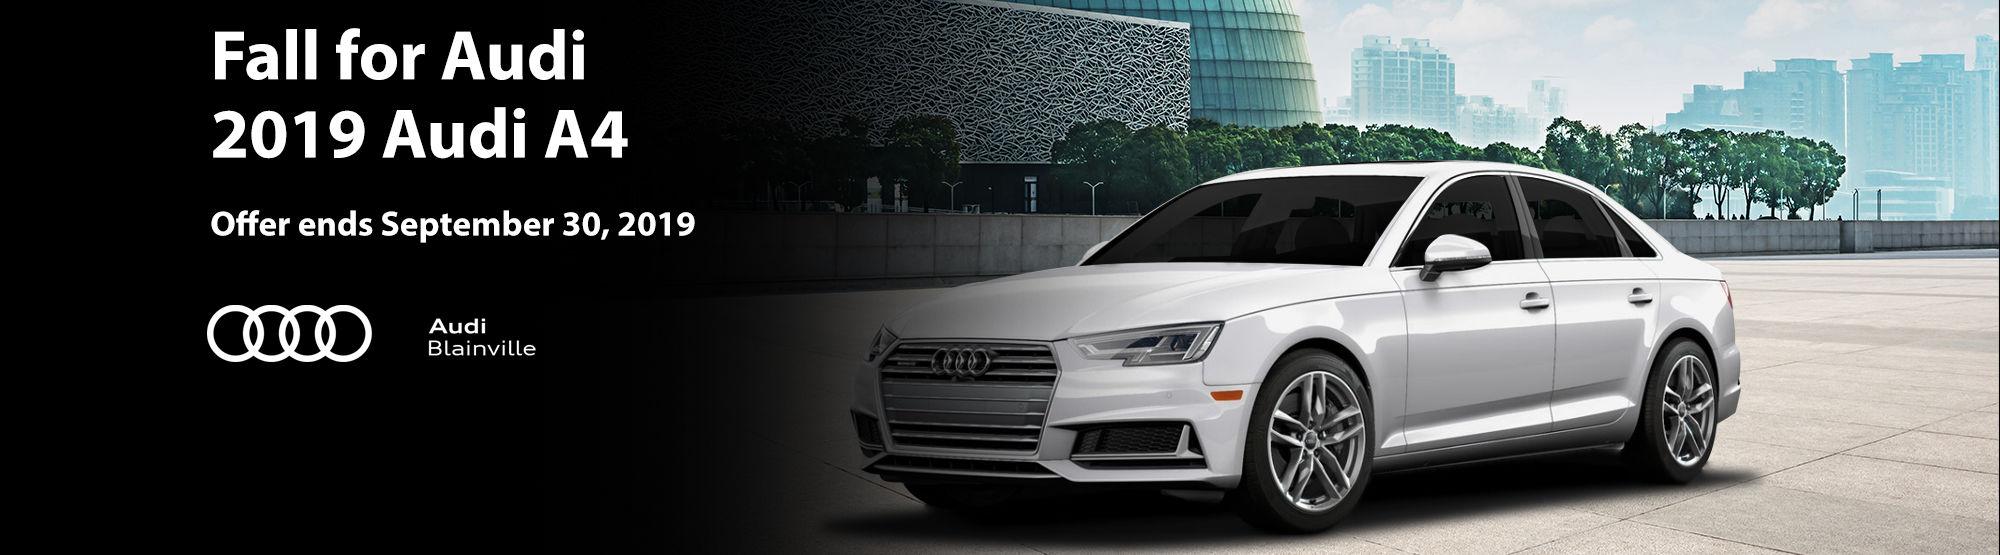 Audi A4 September 2019